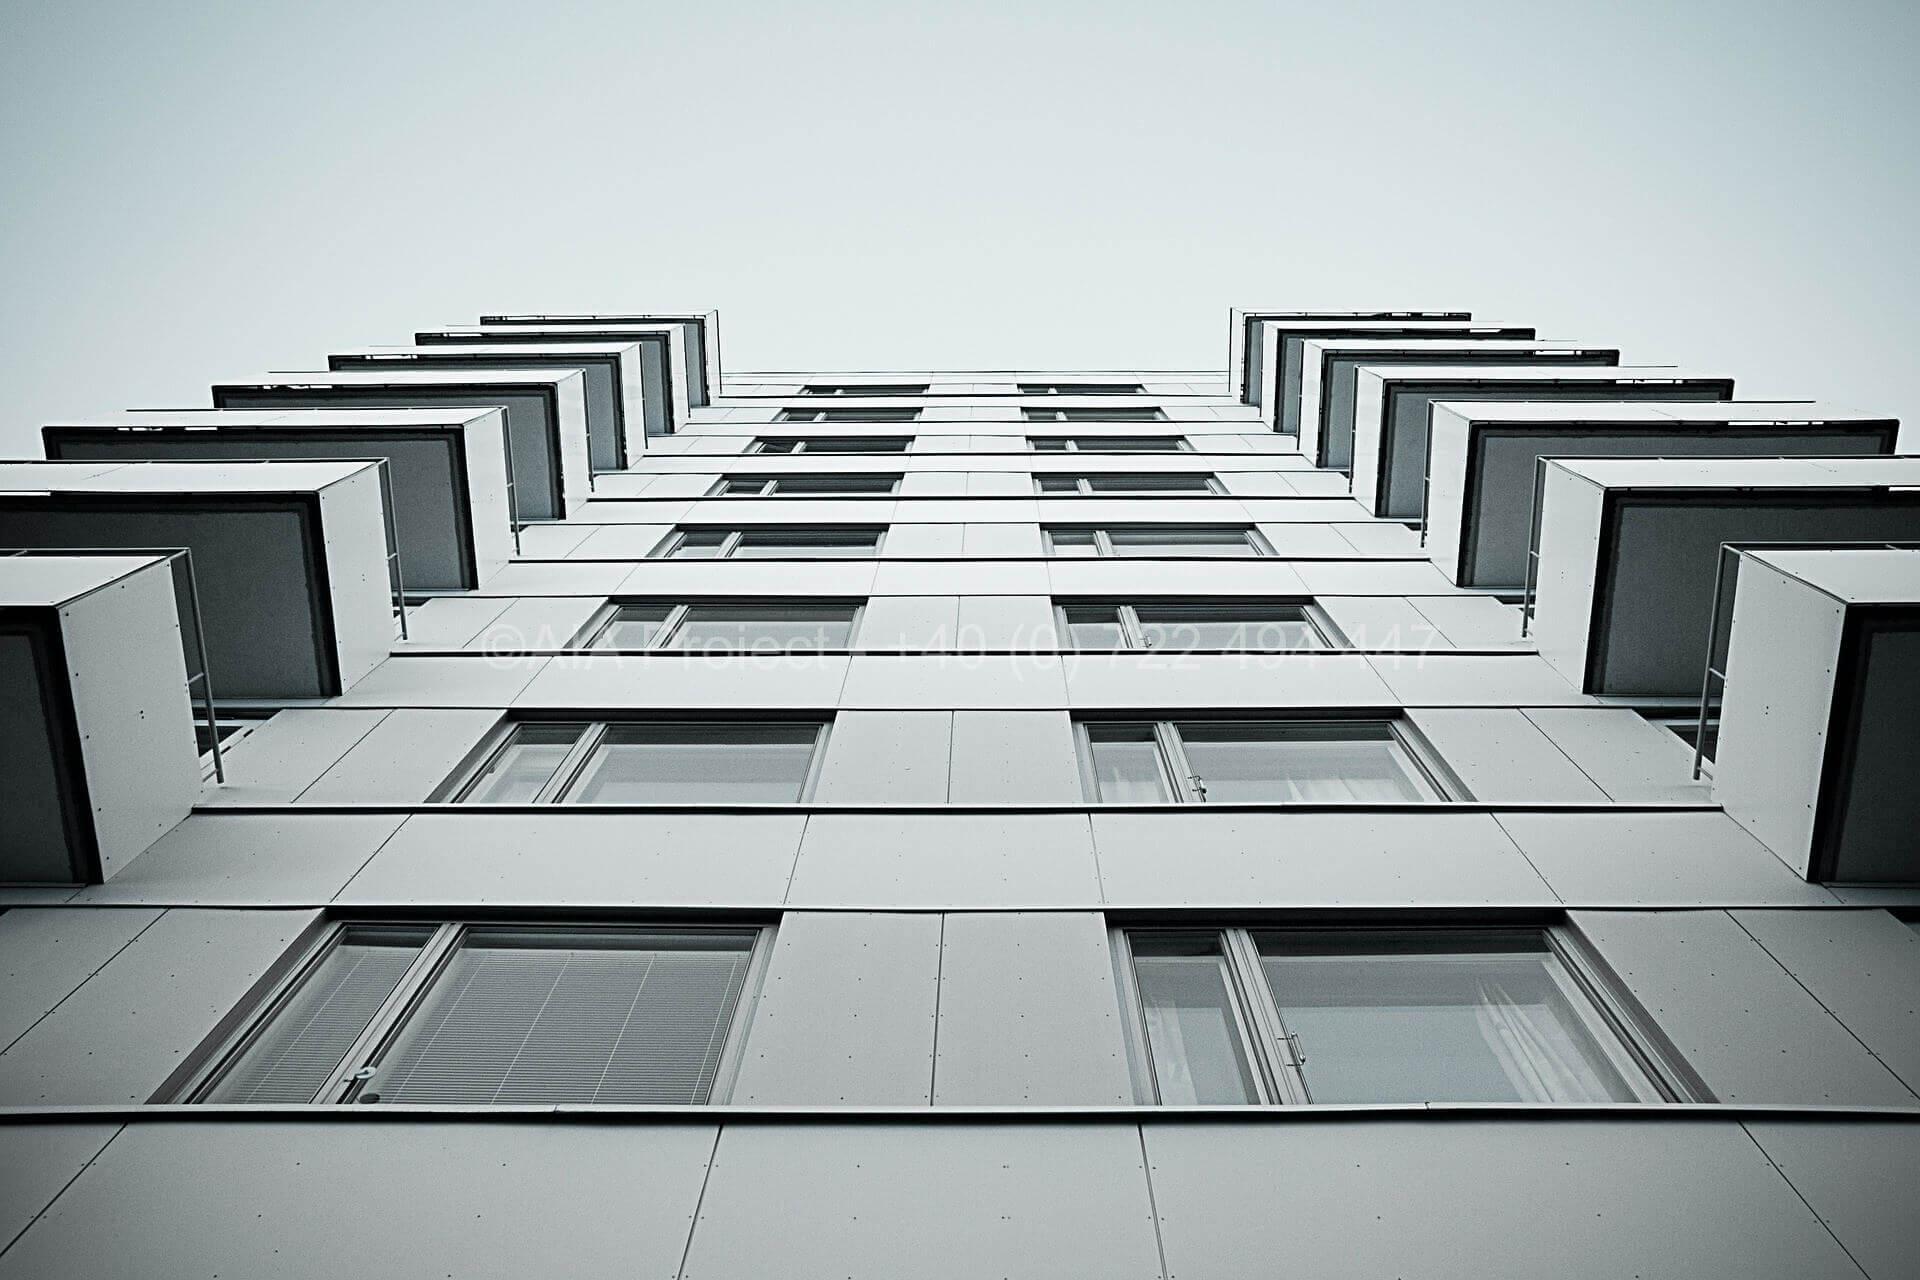 building-802020_1920